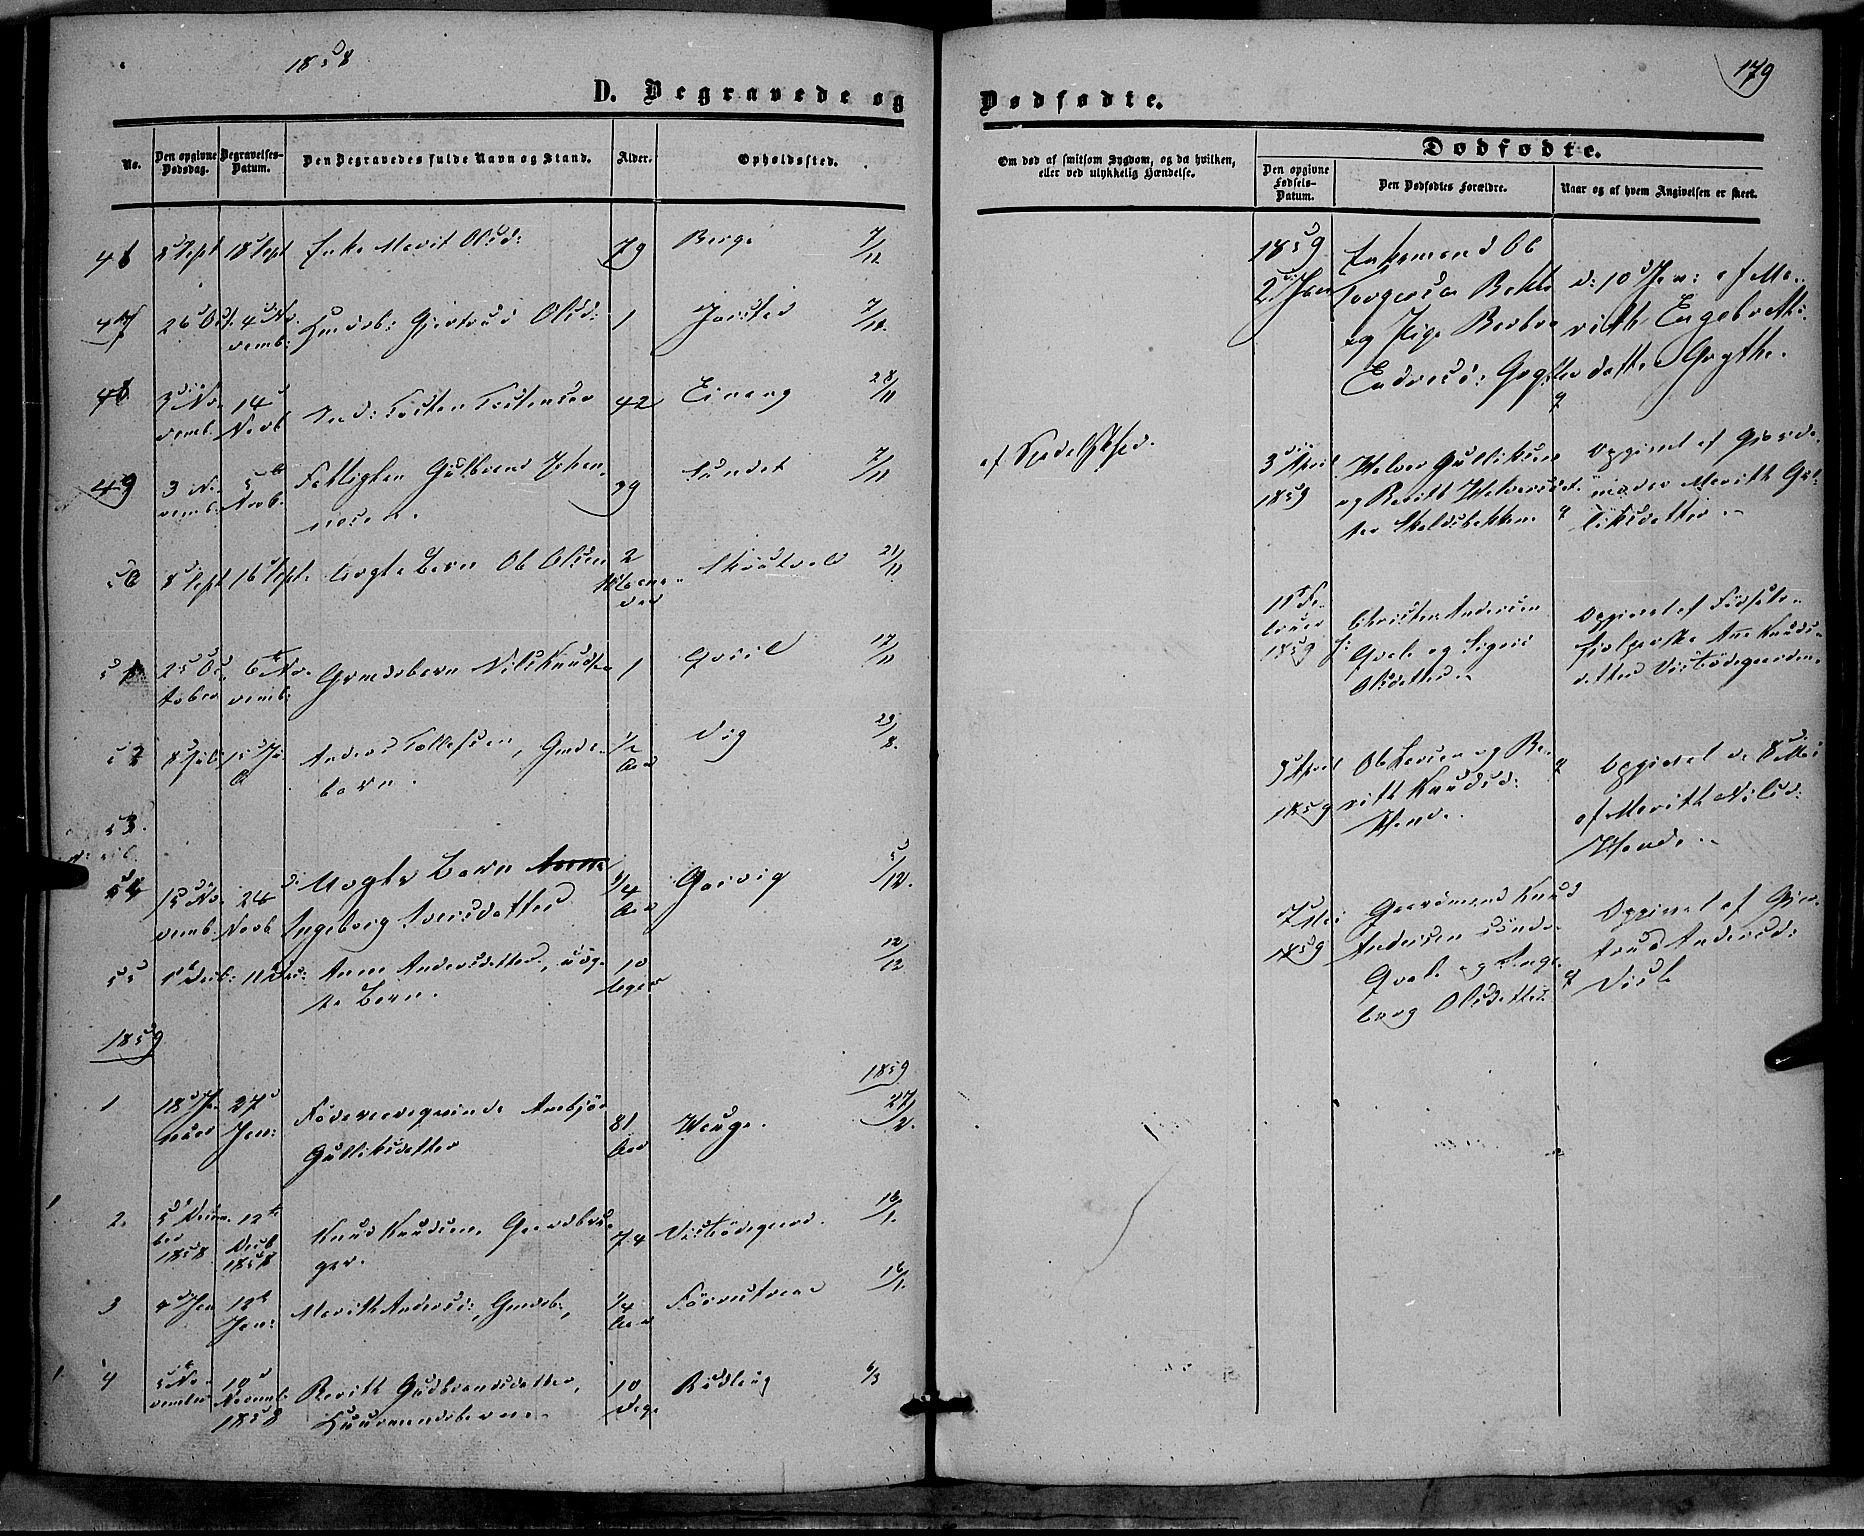 SAH, Vestre Slidre prestekontor, Ministerialbok nr. 2, 1856-1864, s. 179